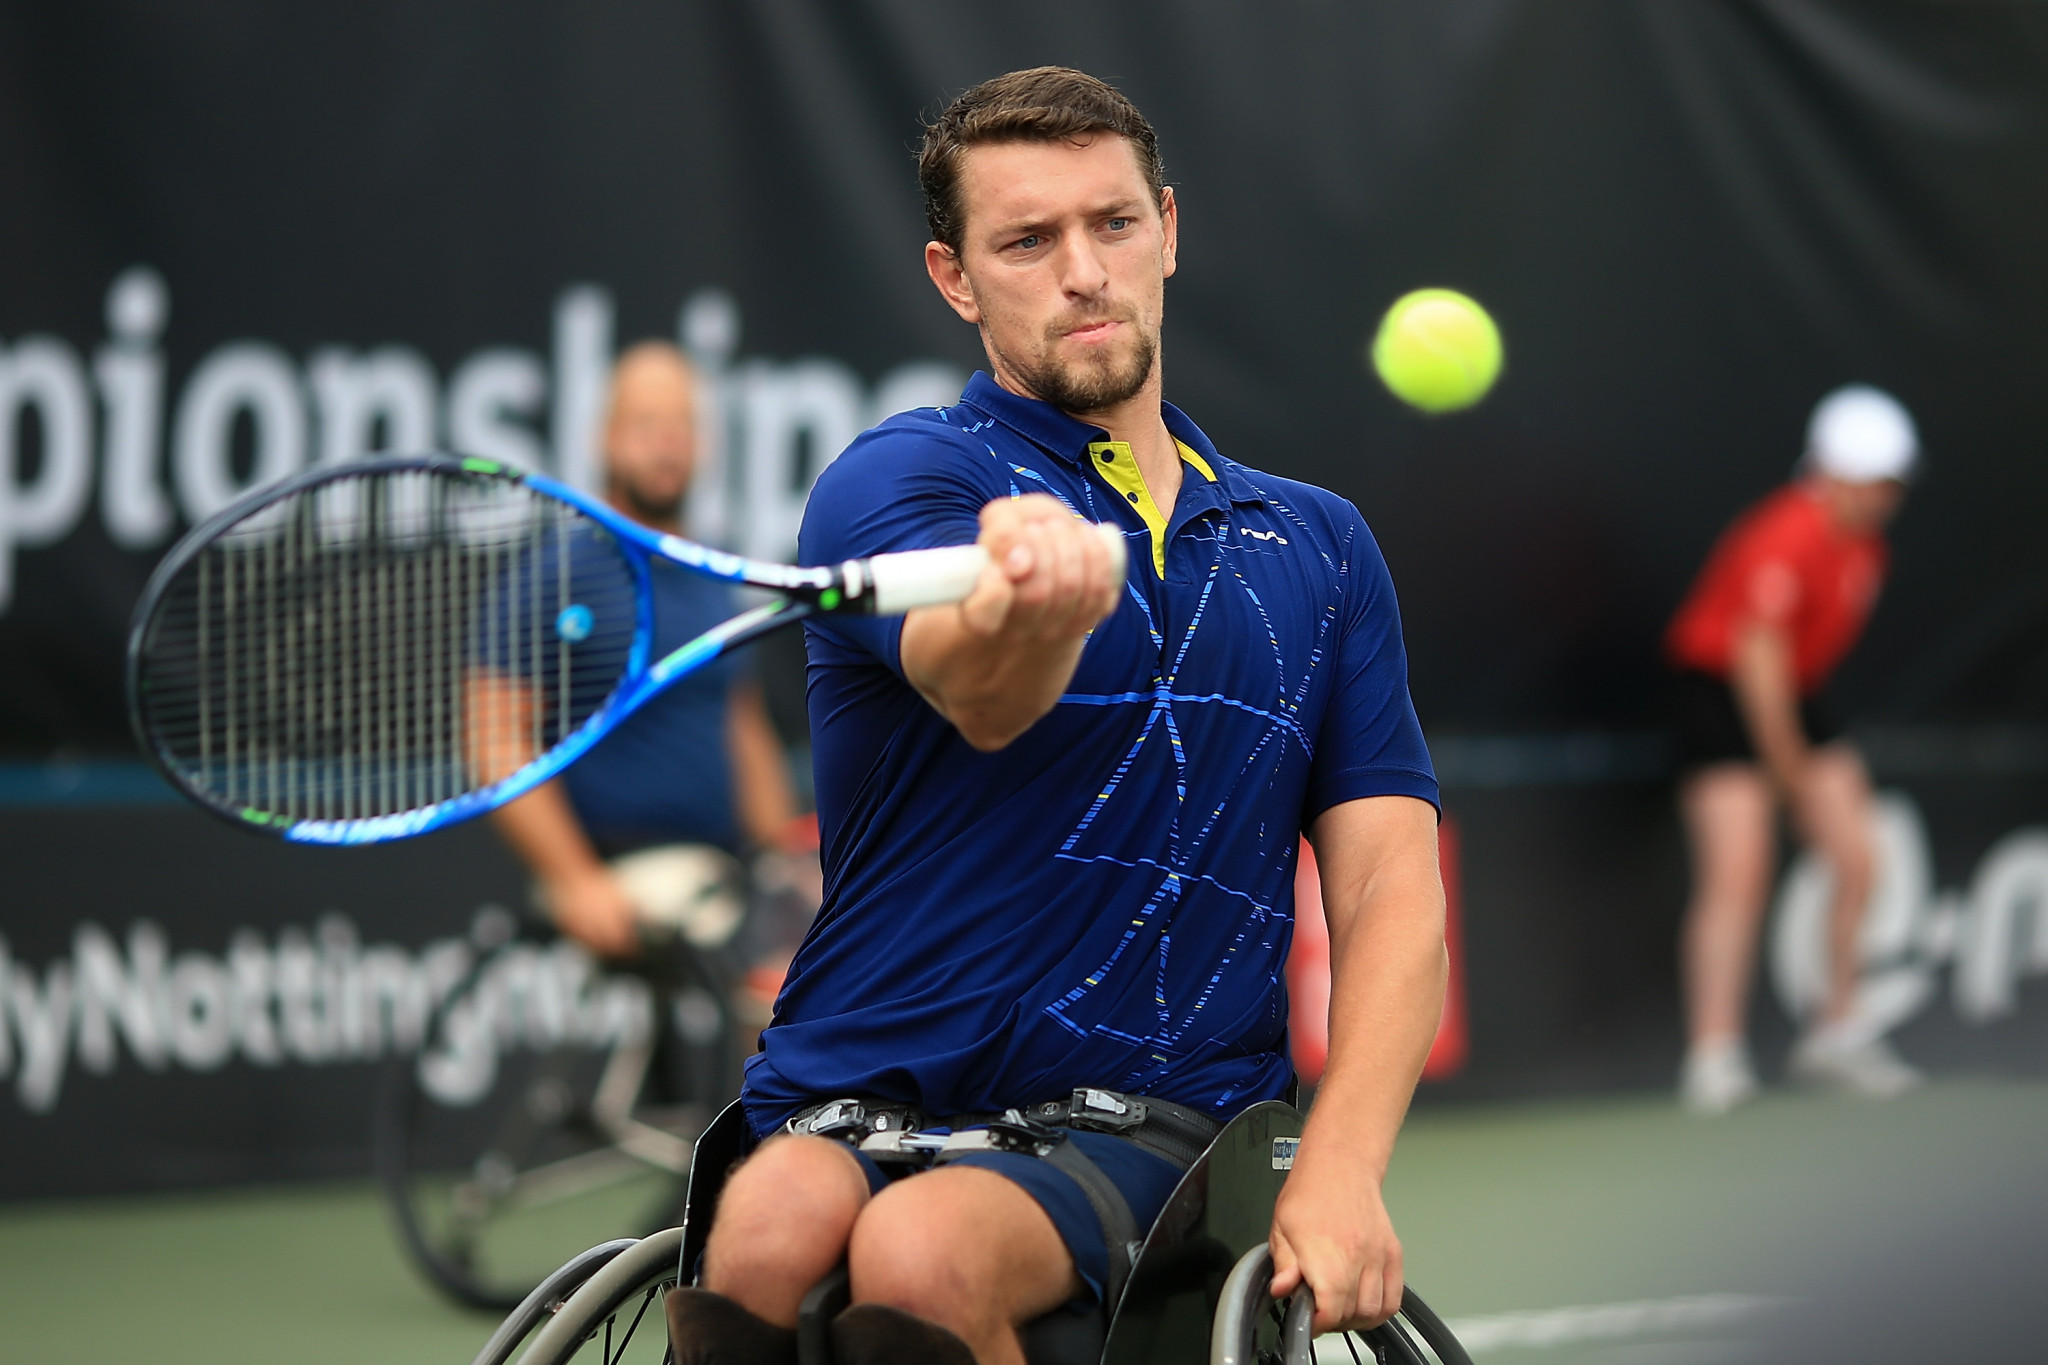 Gerard eyes home success at Belgian Open Wheelchair Tennis tournament